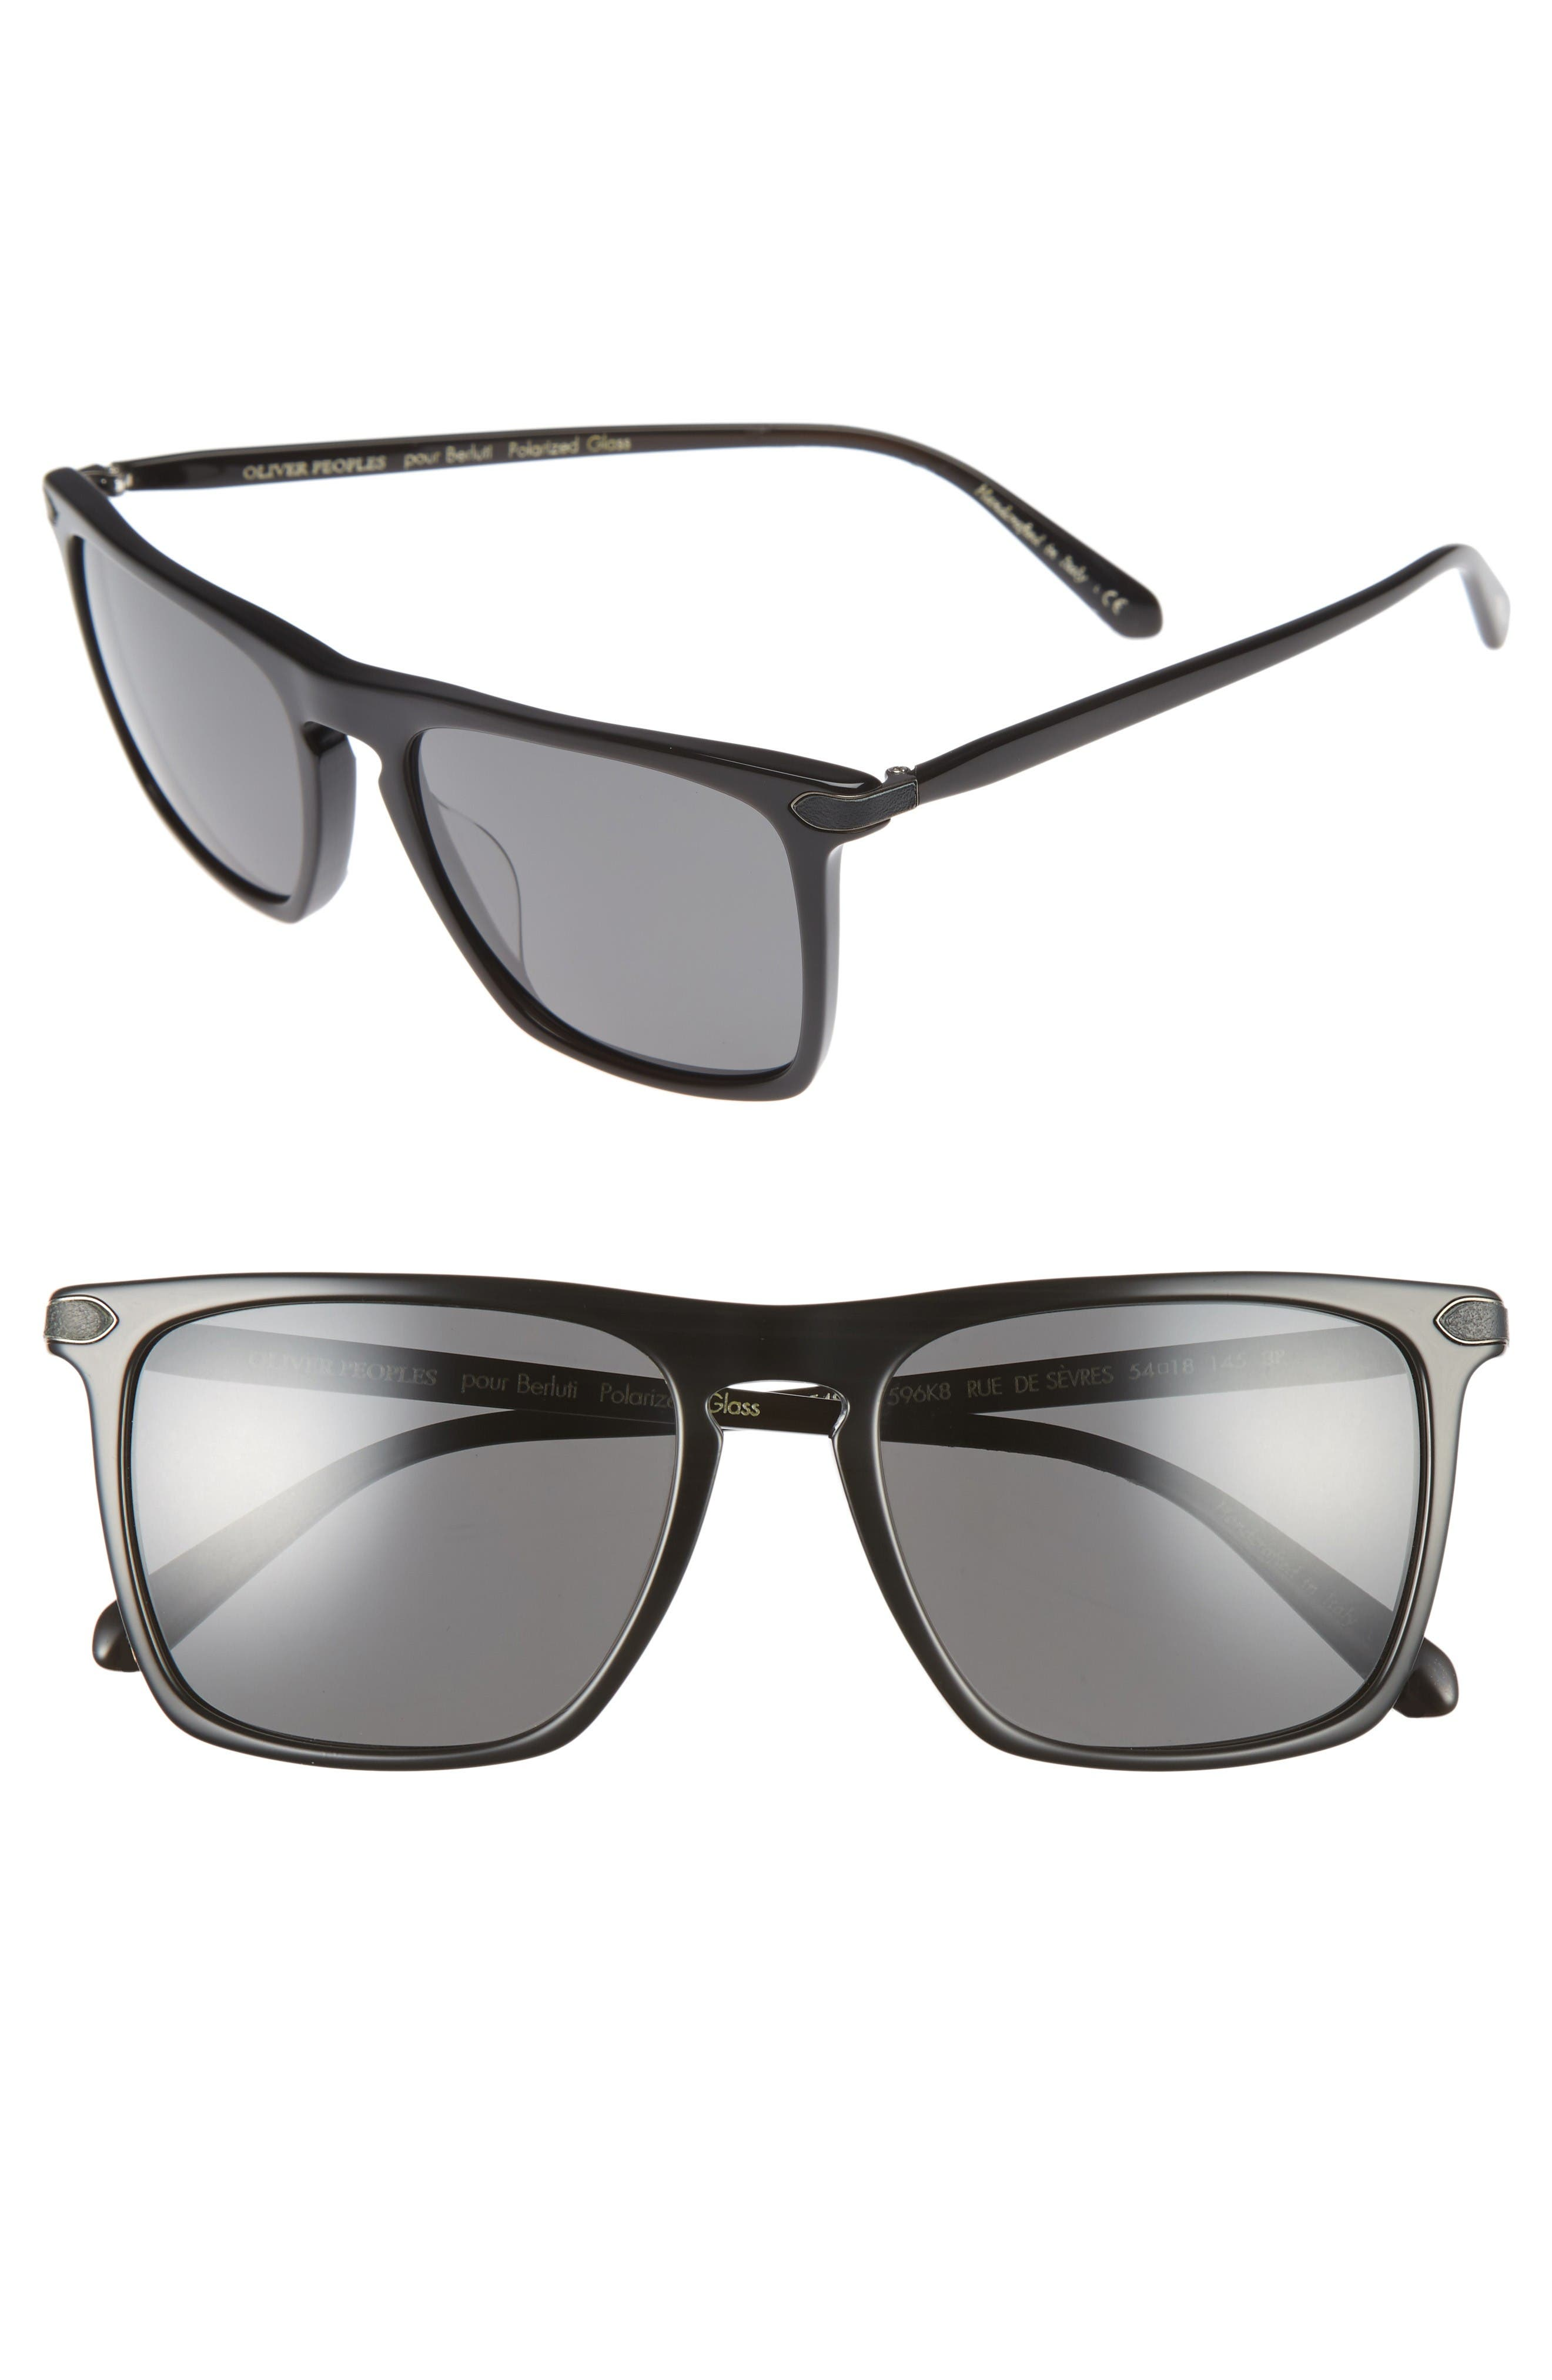 Rue De Sevres 54mm Polarized Sunglasses,                         Main,                         color, Black